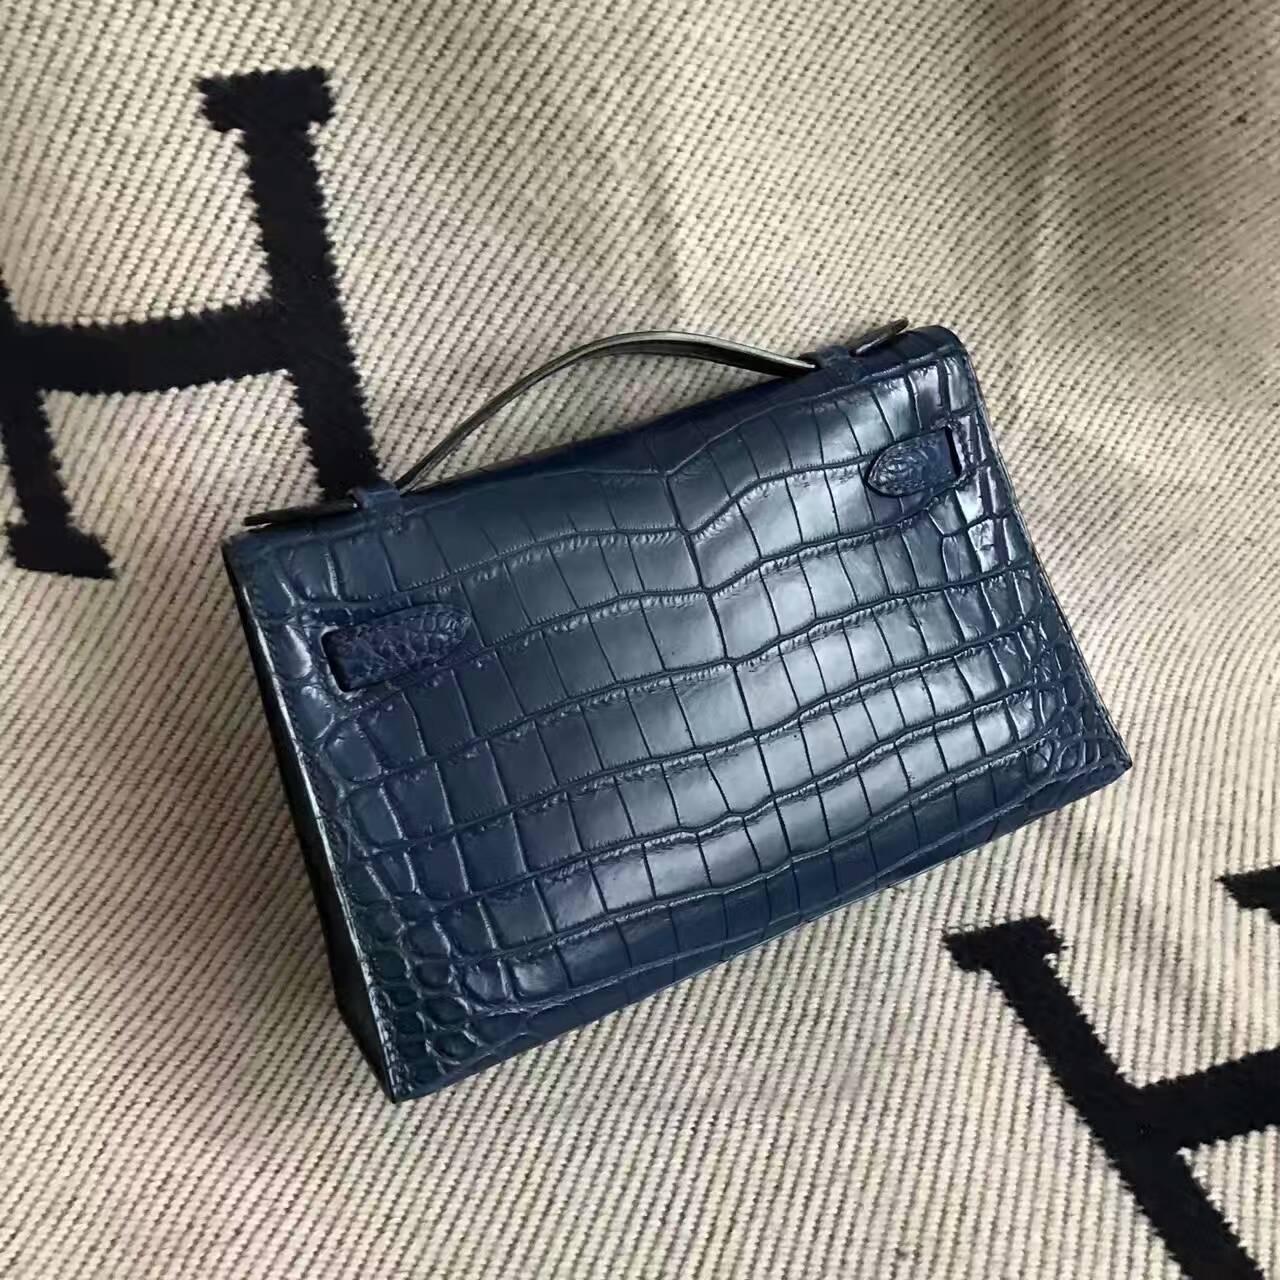 High Quality Hermes Crocodile Matt Leather Minikelly22cm Handbag in 73 Blue Saphir